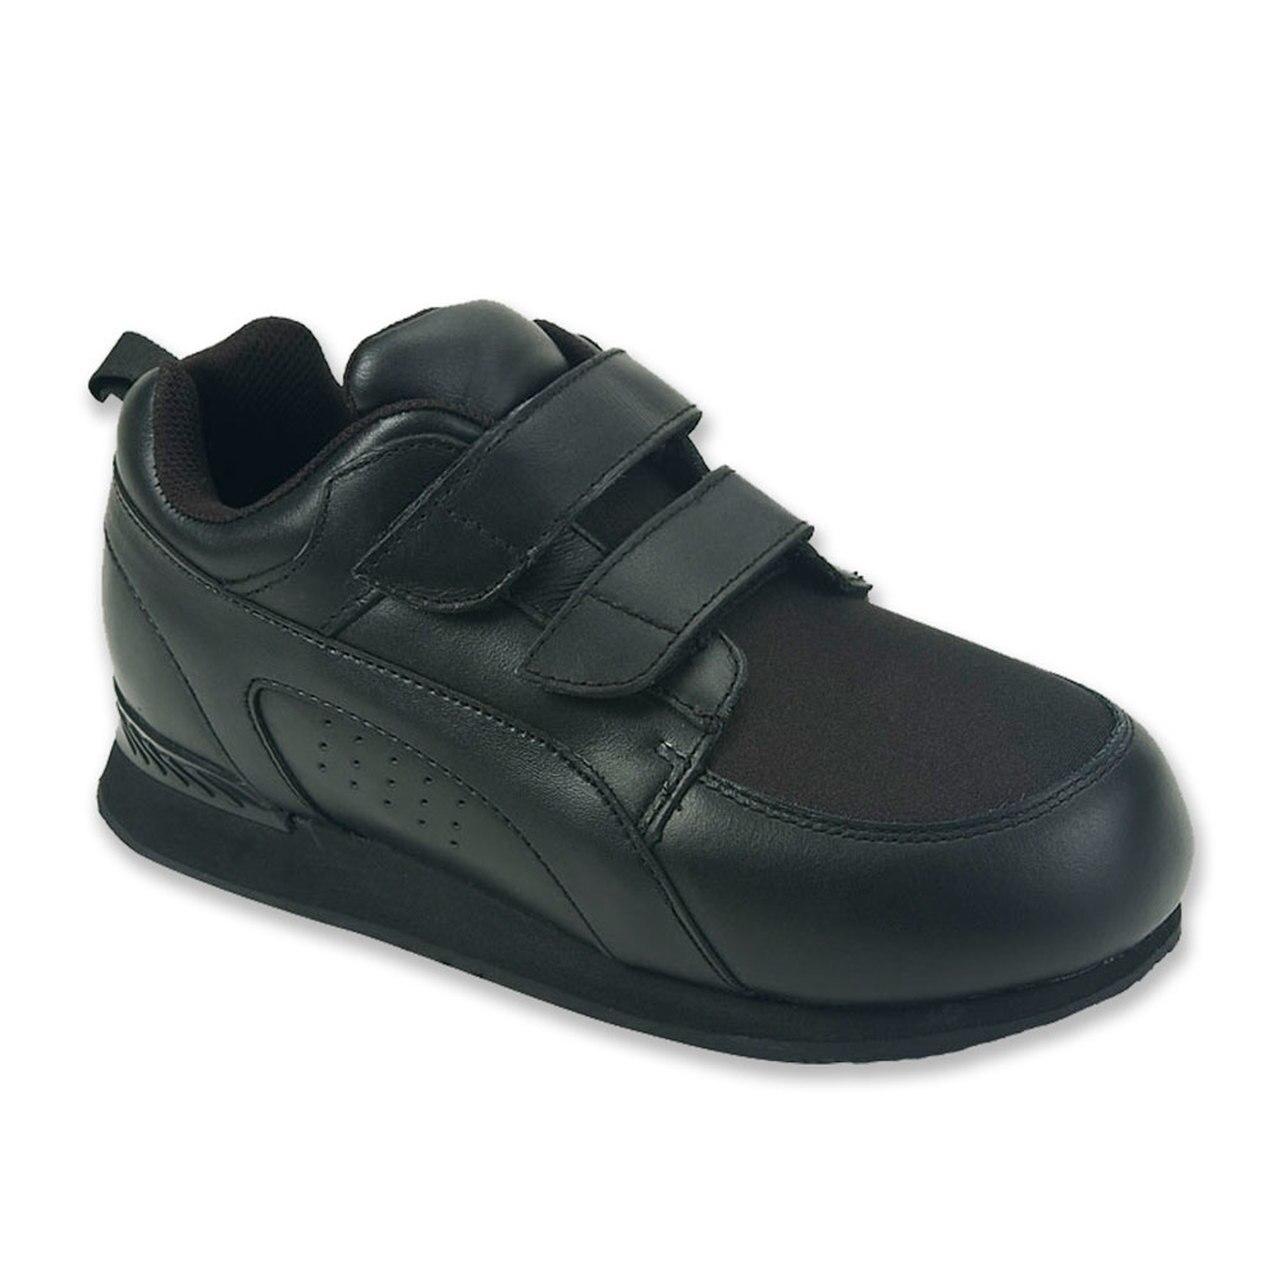 Pedors Unisex Stretch Walker Black Orthopedic Shoes (Pair)